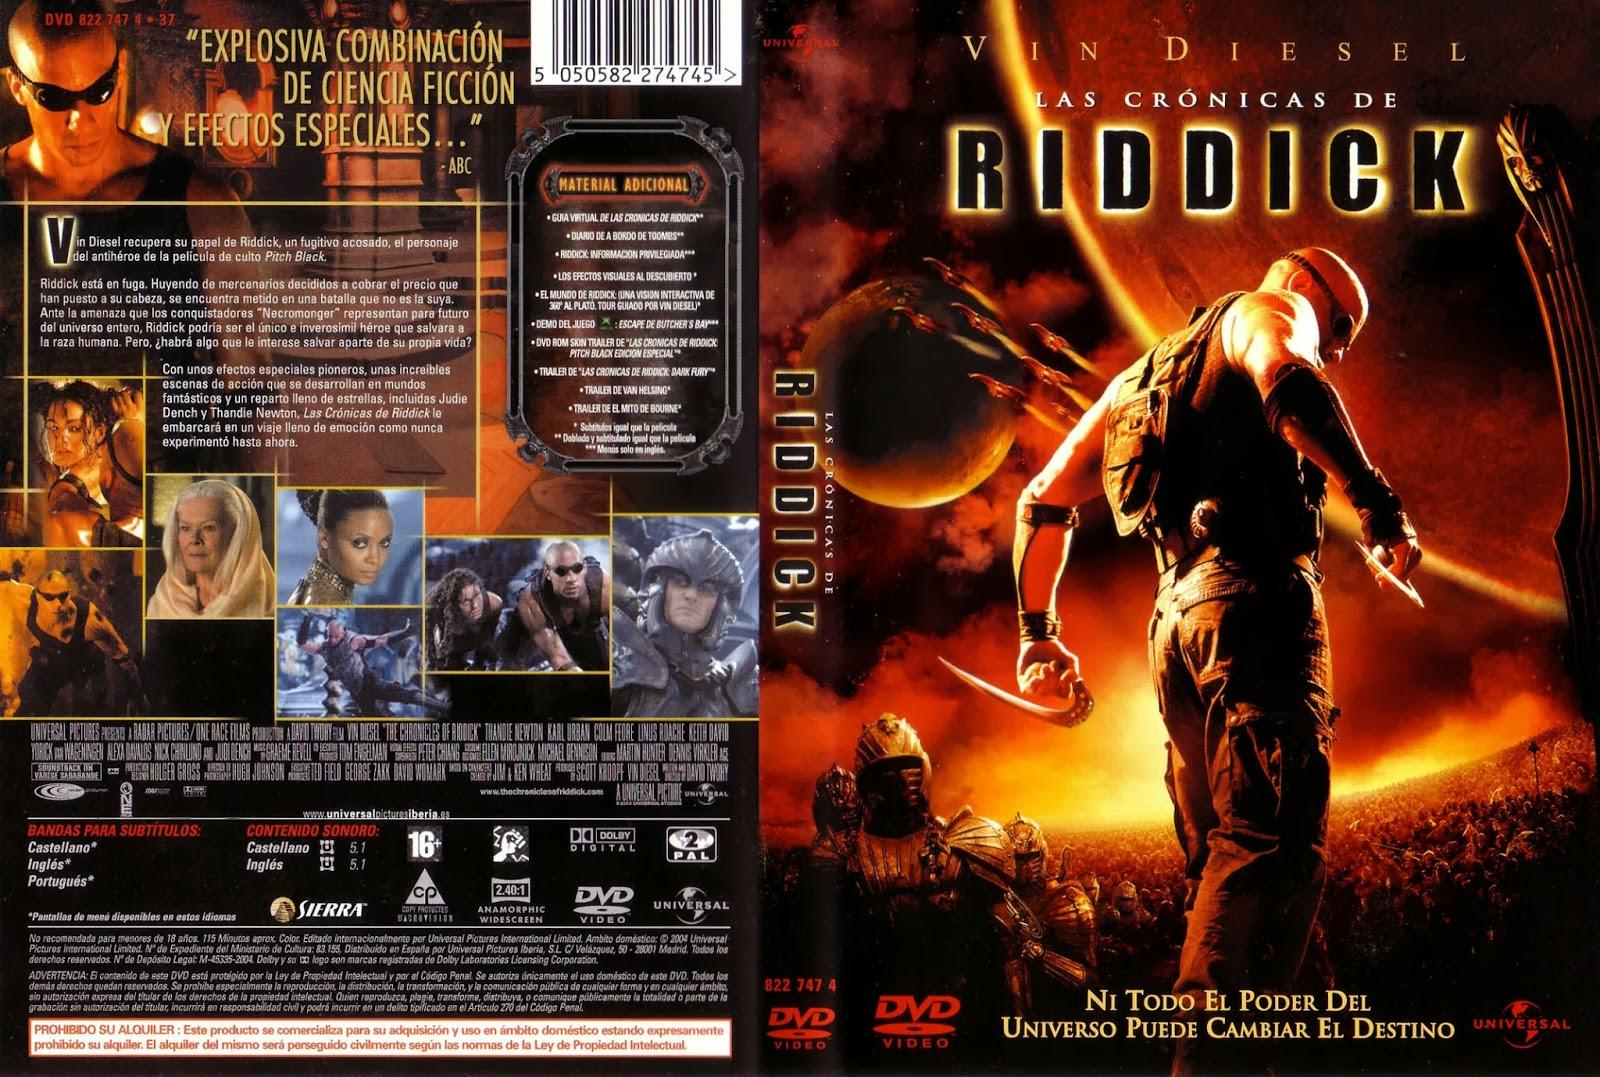 Las Cronicas De Riddick (Version Extendida) DVD